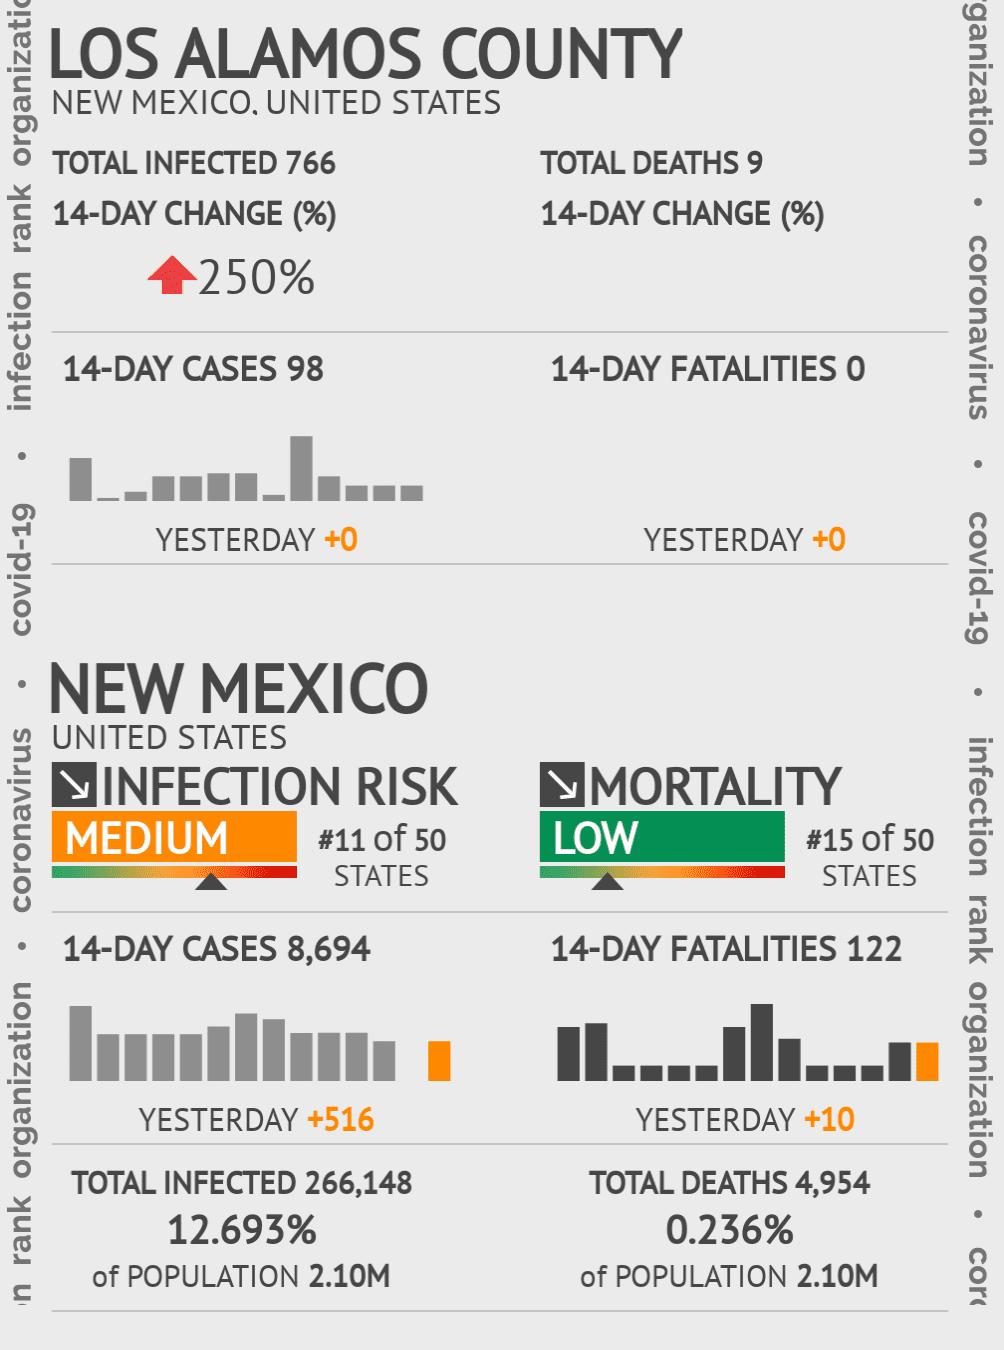 Los Alamos County Coronavirus Covid-19 Risk of Infection on July 24, 2021